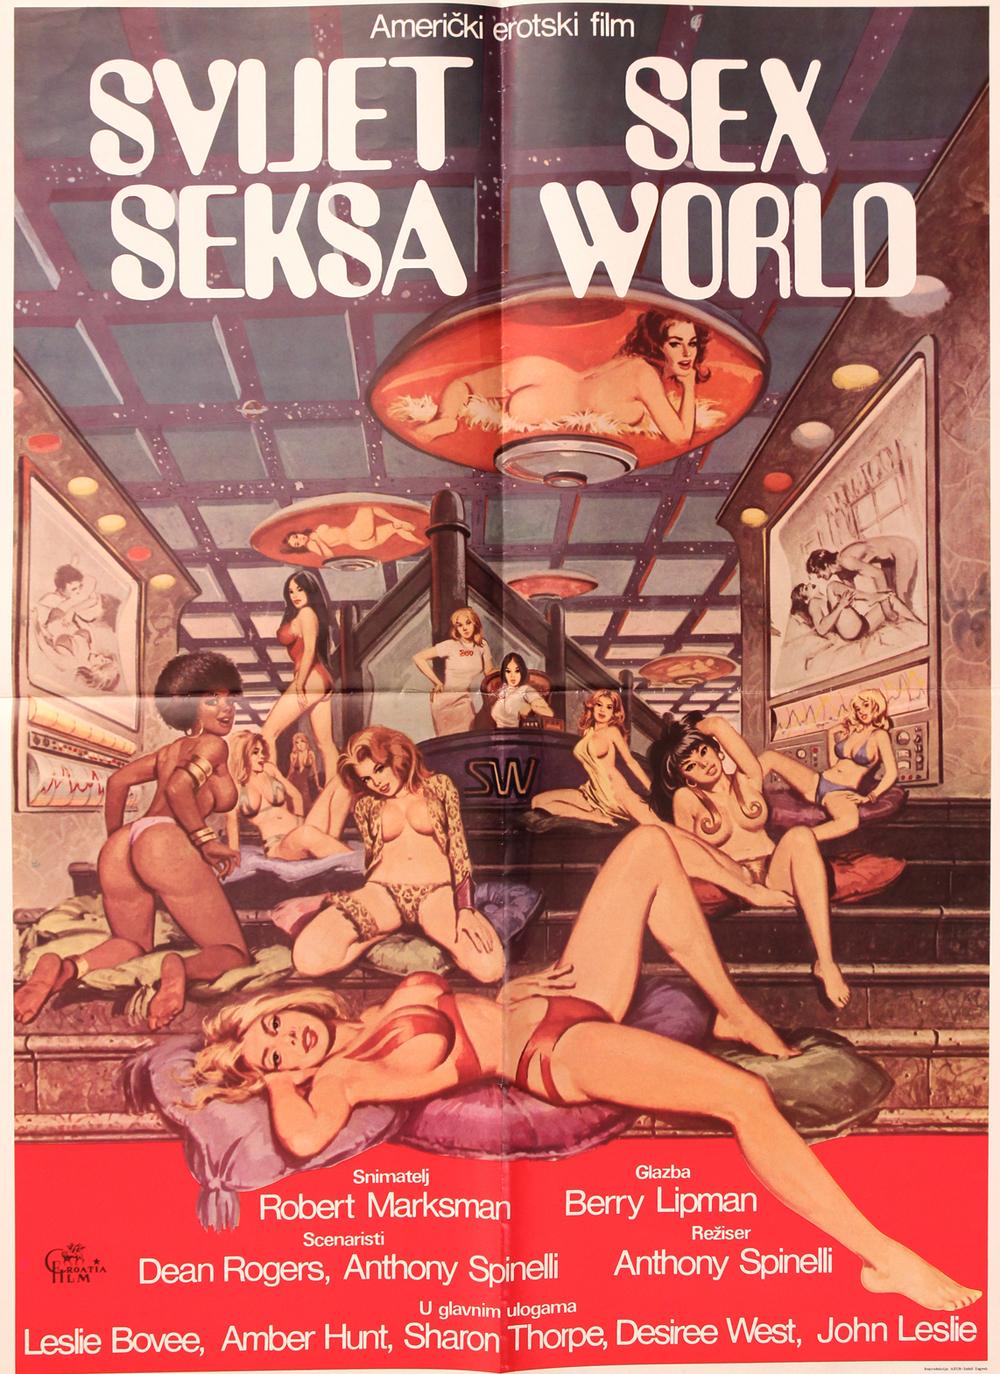 Sex World - Italian 2F Manifesto